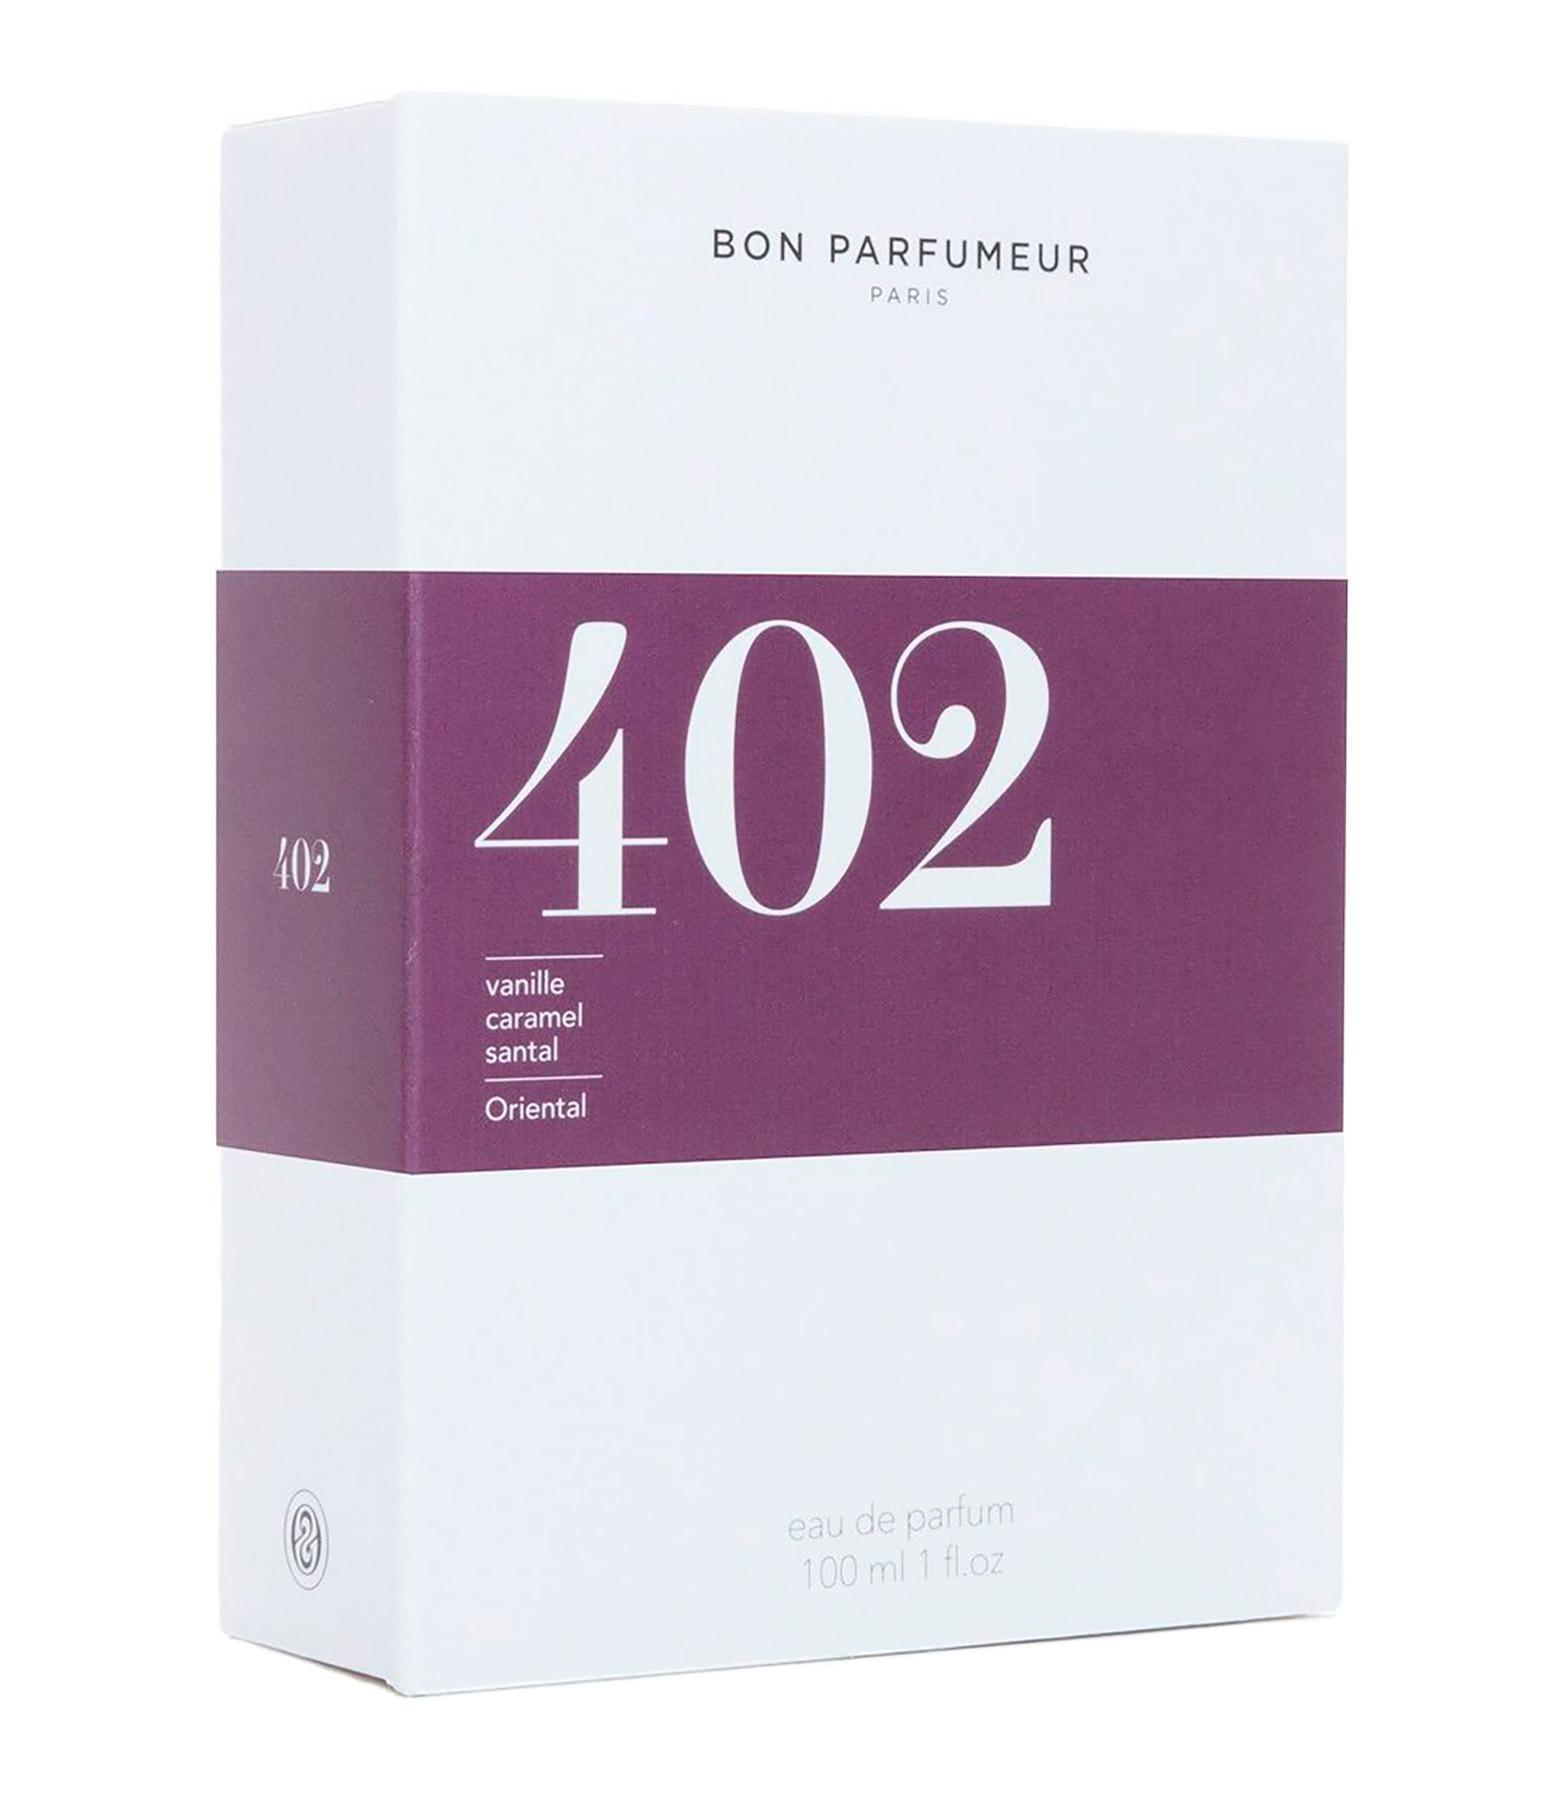 BON PARFUMEUR - au de Parfum #402 Vanille, Caramel, Santal, 100 ml